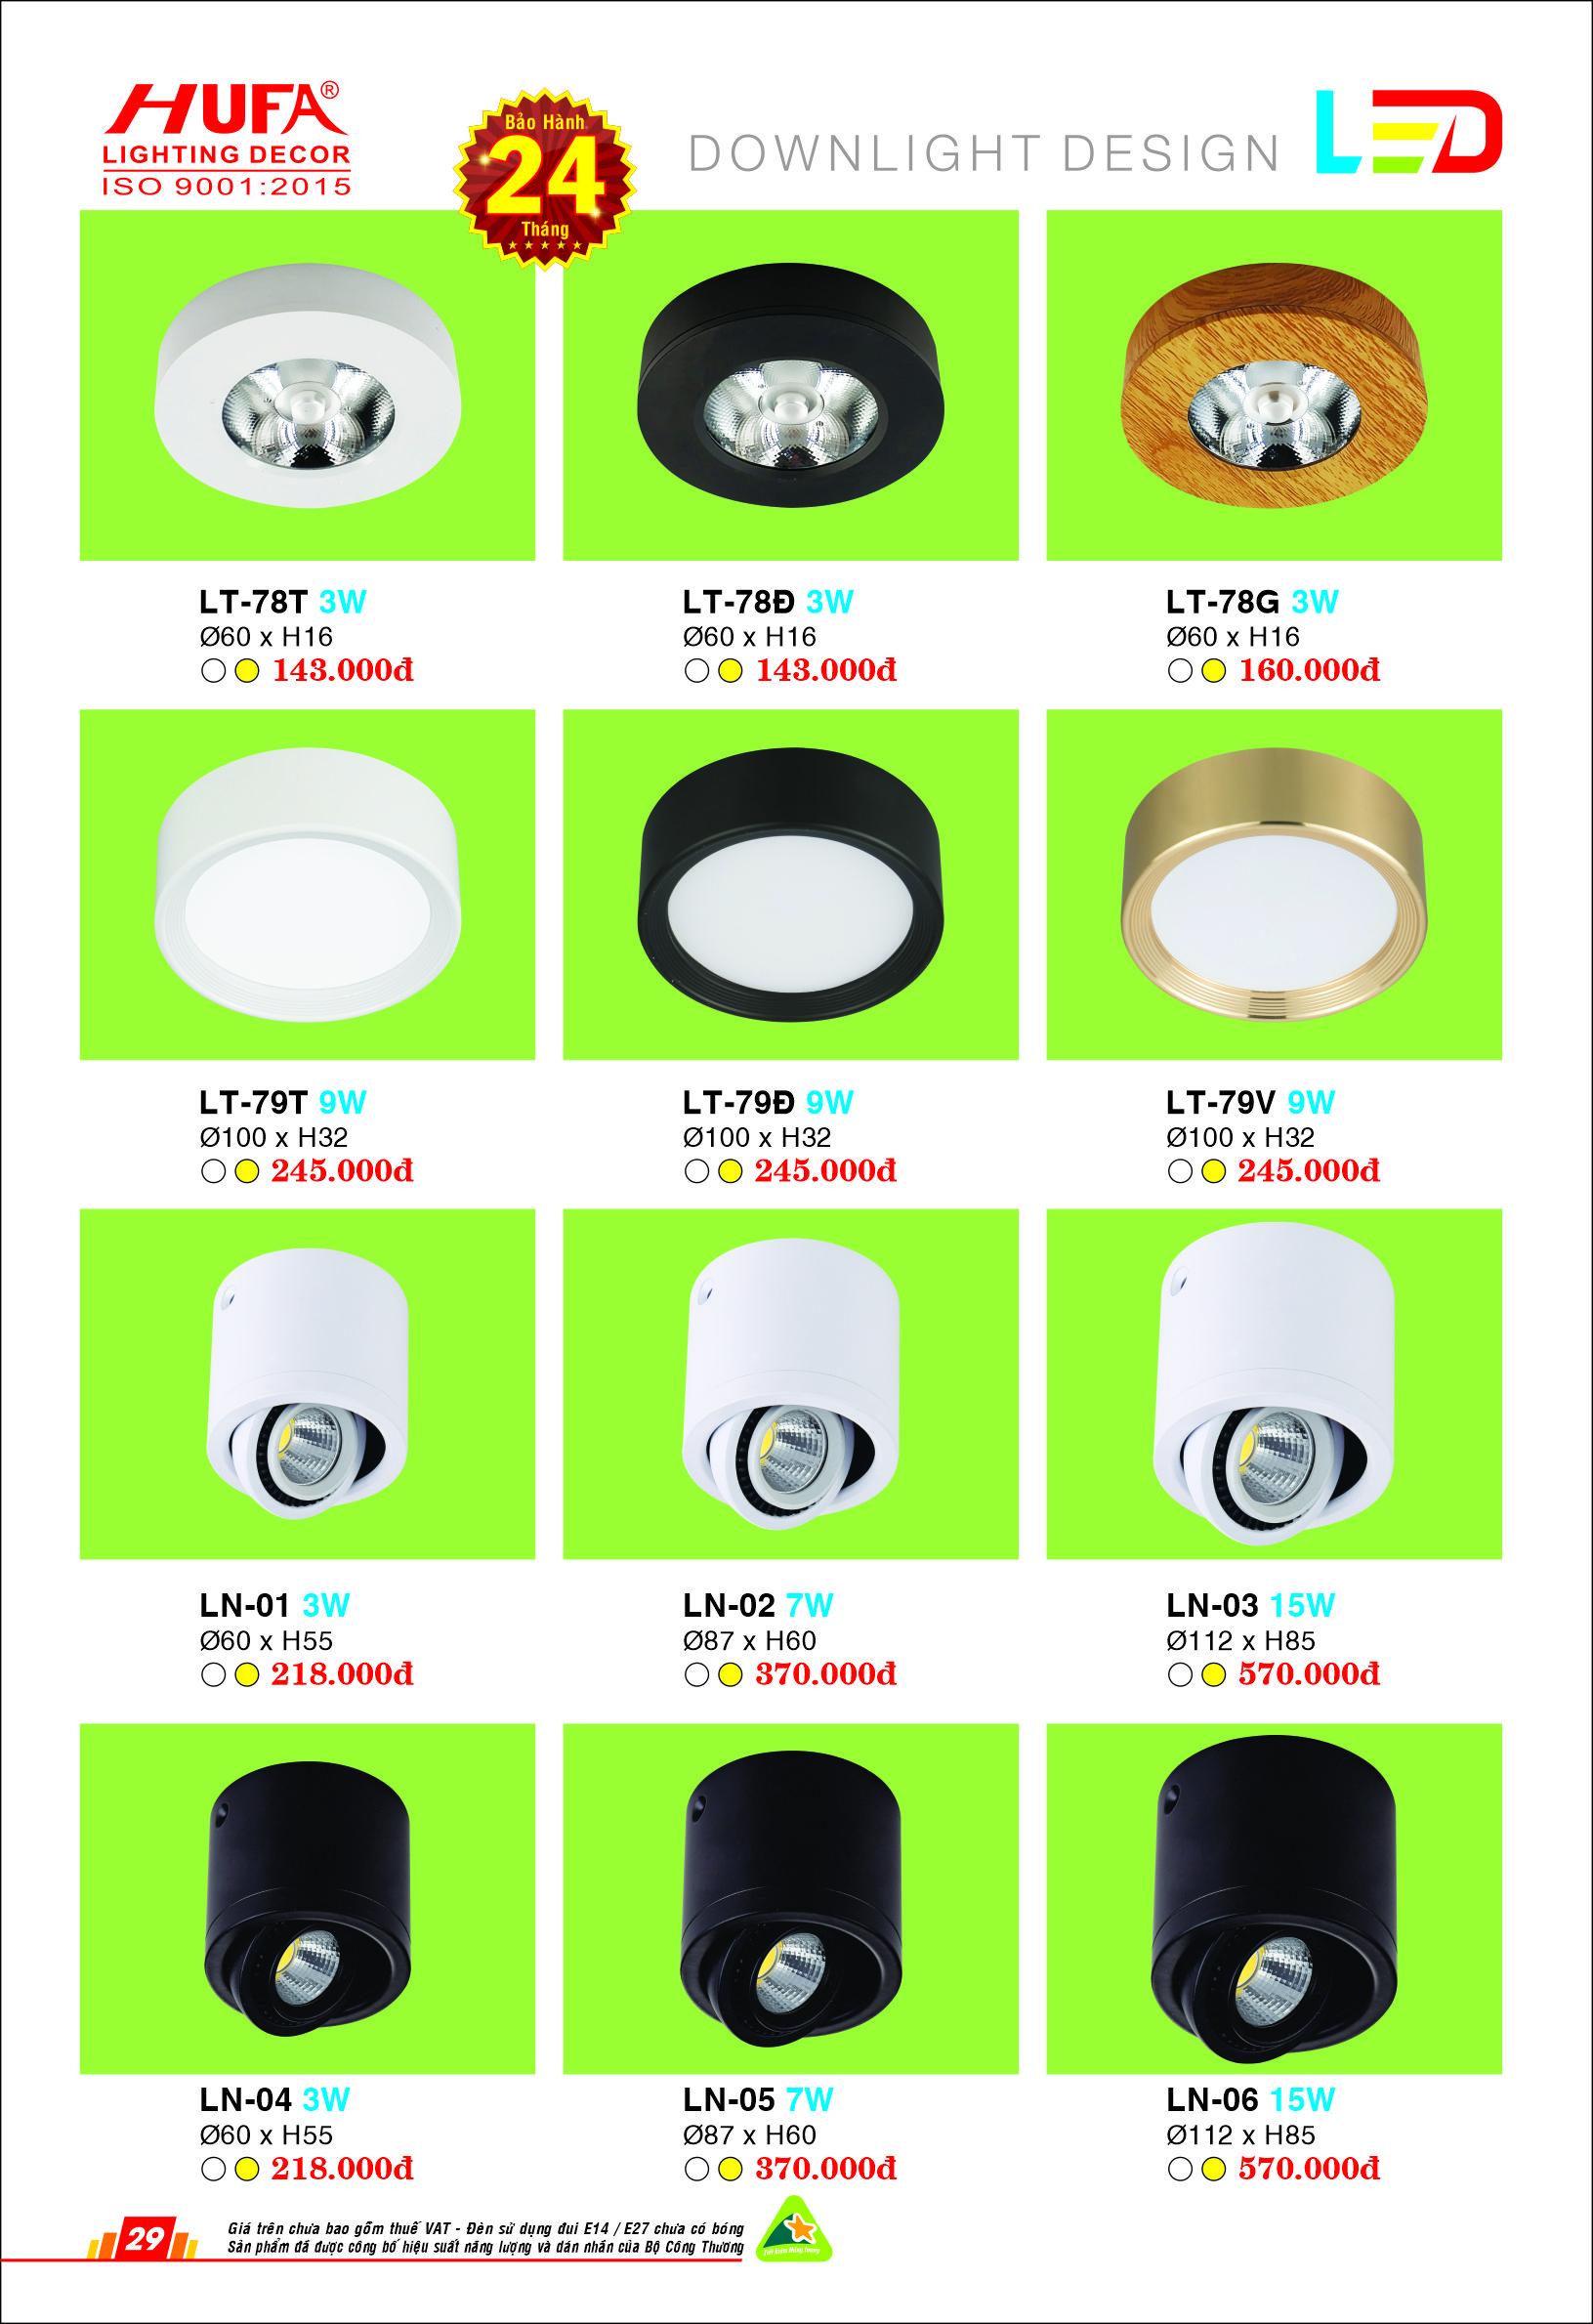 den led lon downlight 3 - Đèn led lon Downlight Design ốp nổi